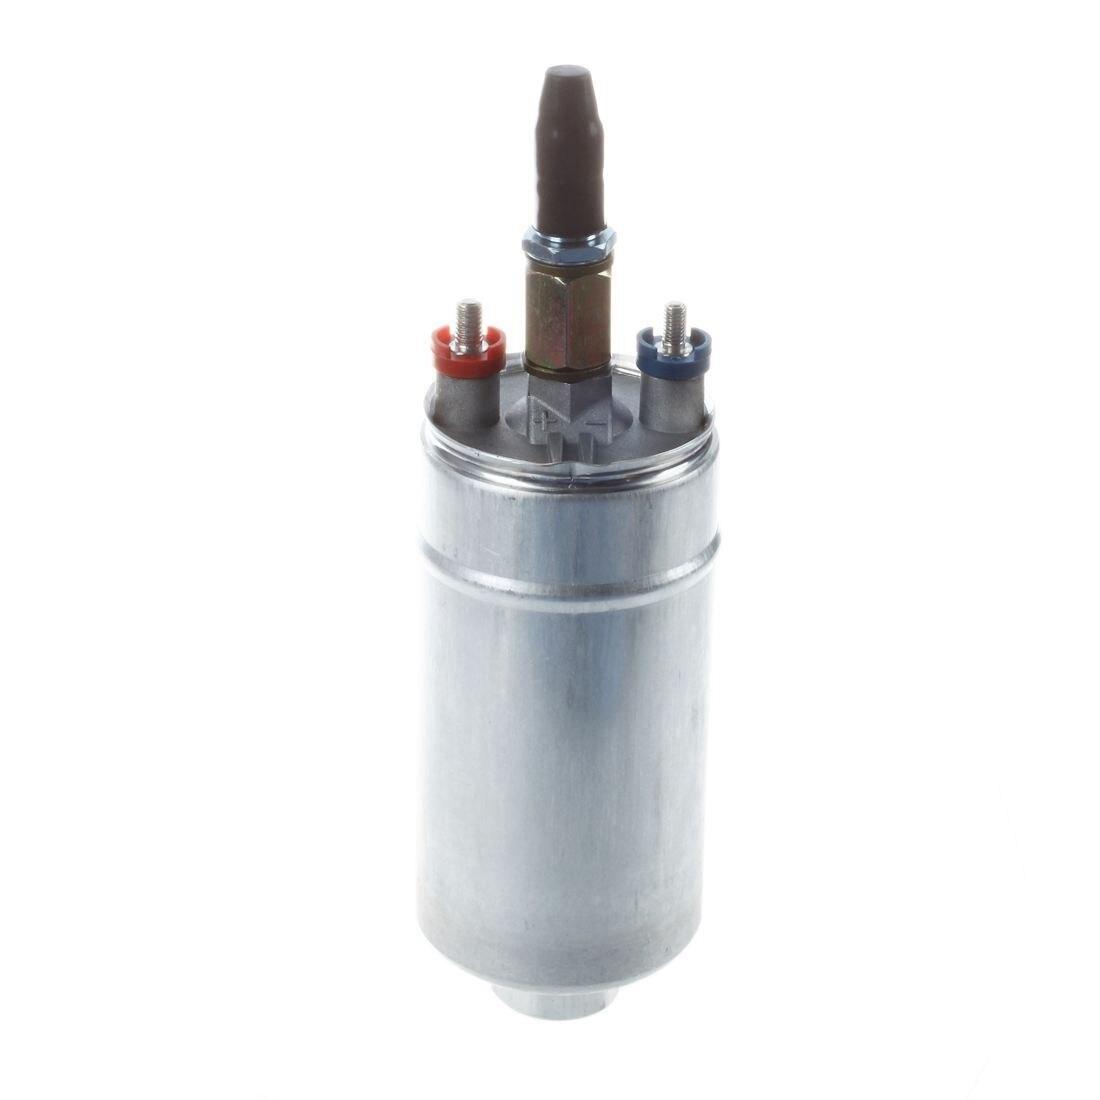 300LPH External Inline Fuel Pump Replacement 044 For 0580254044 xzl 3087 1 replacement elecric fuel pump for fox silver blue